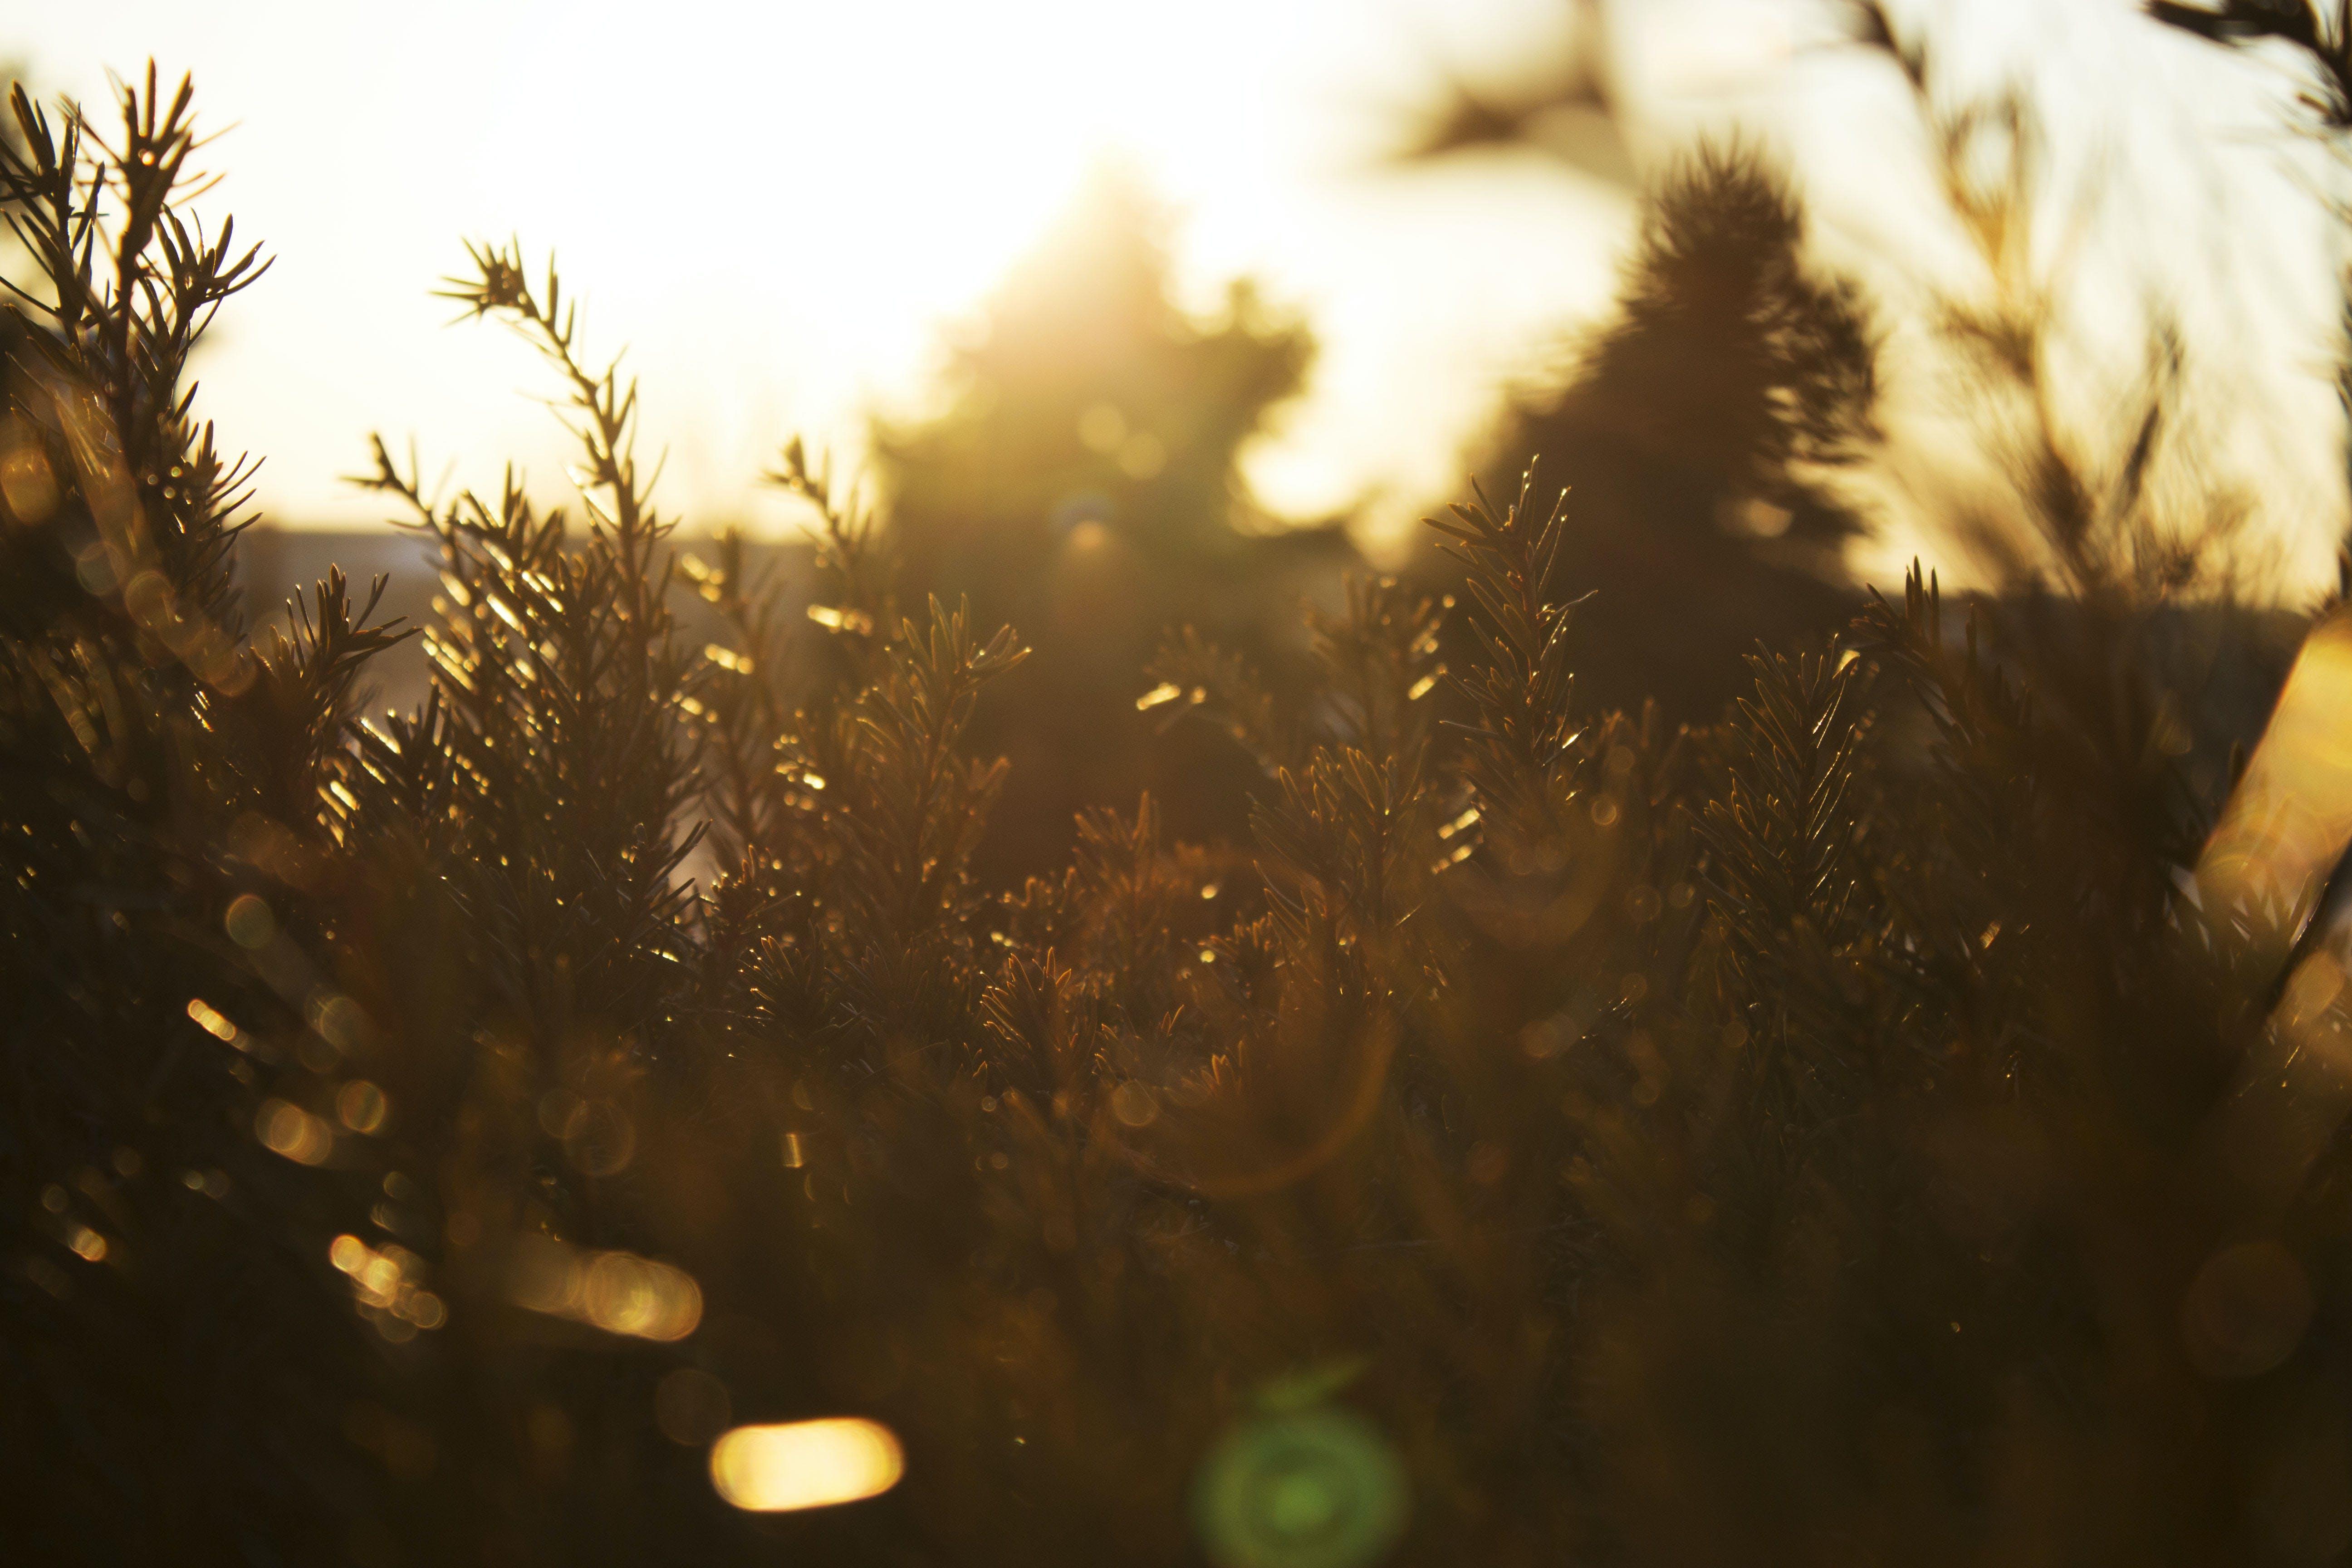 Free stock photo of light, sunset, blur, plants